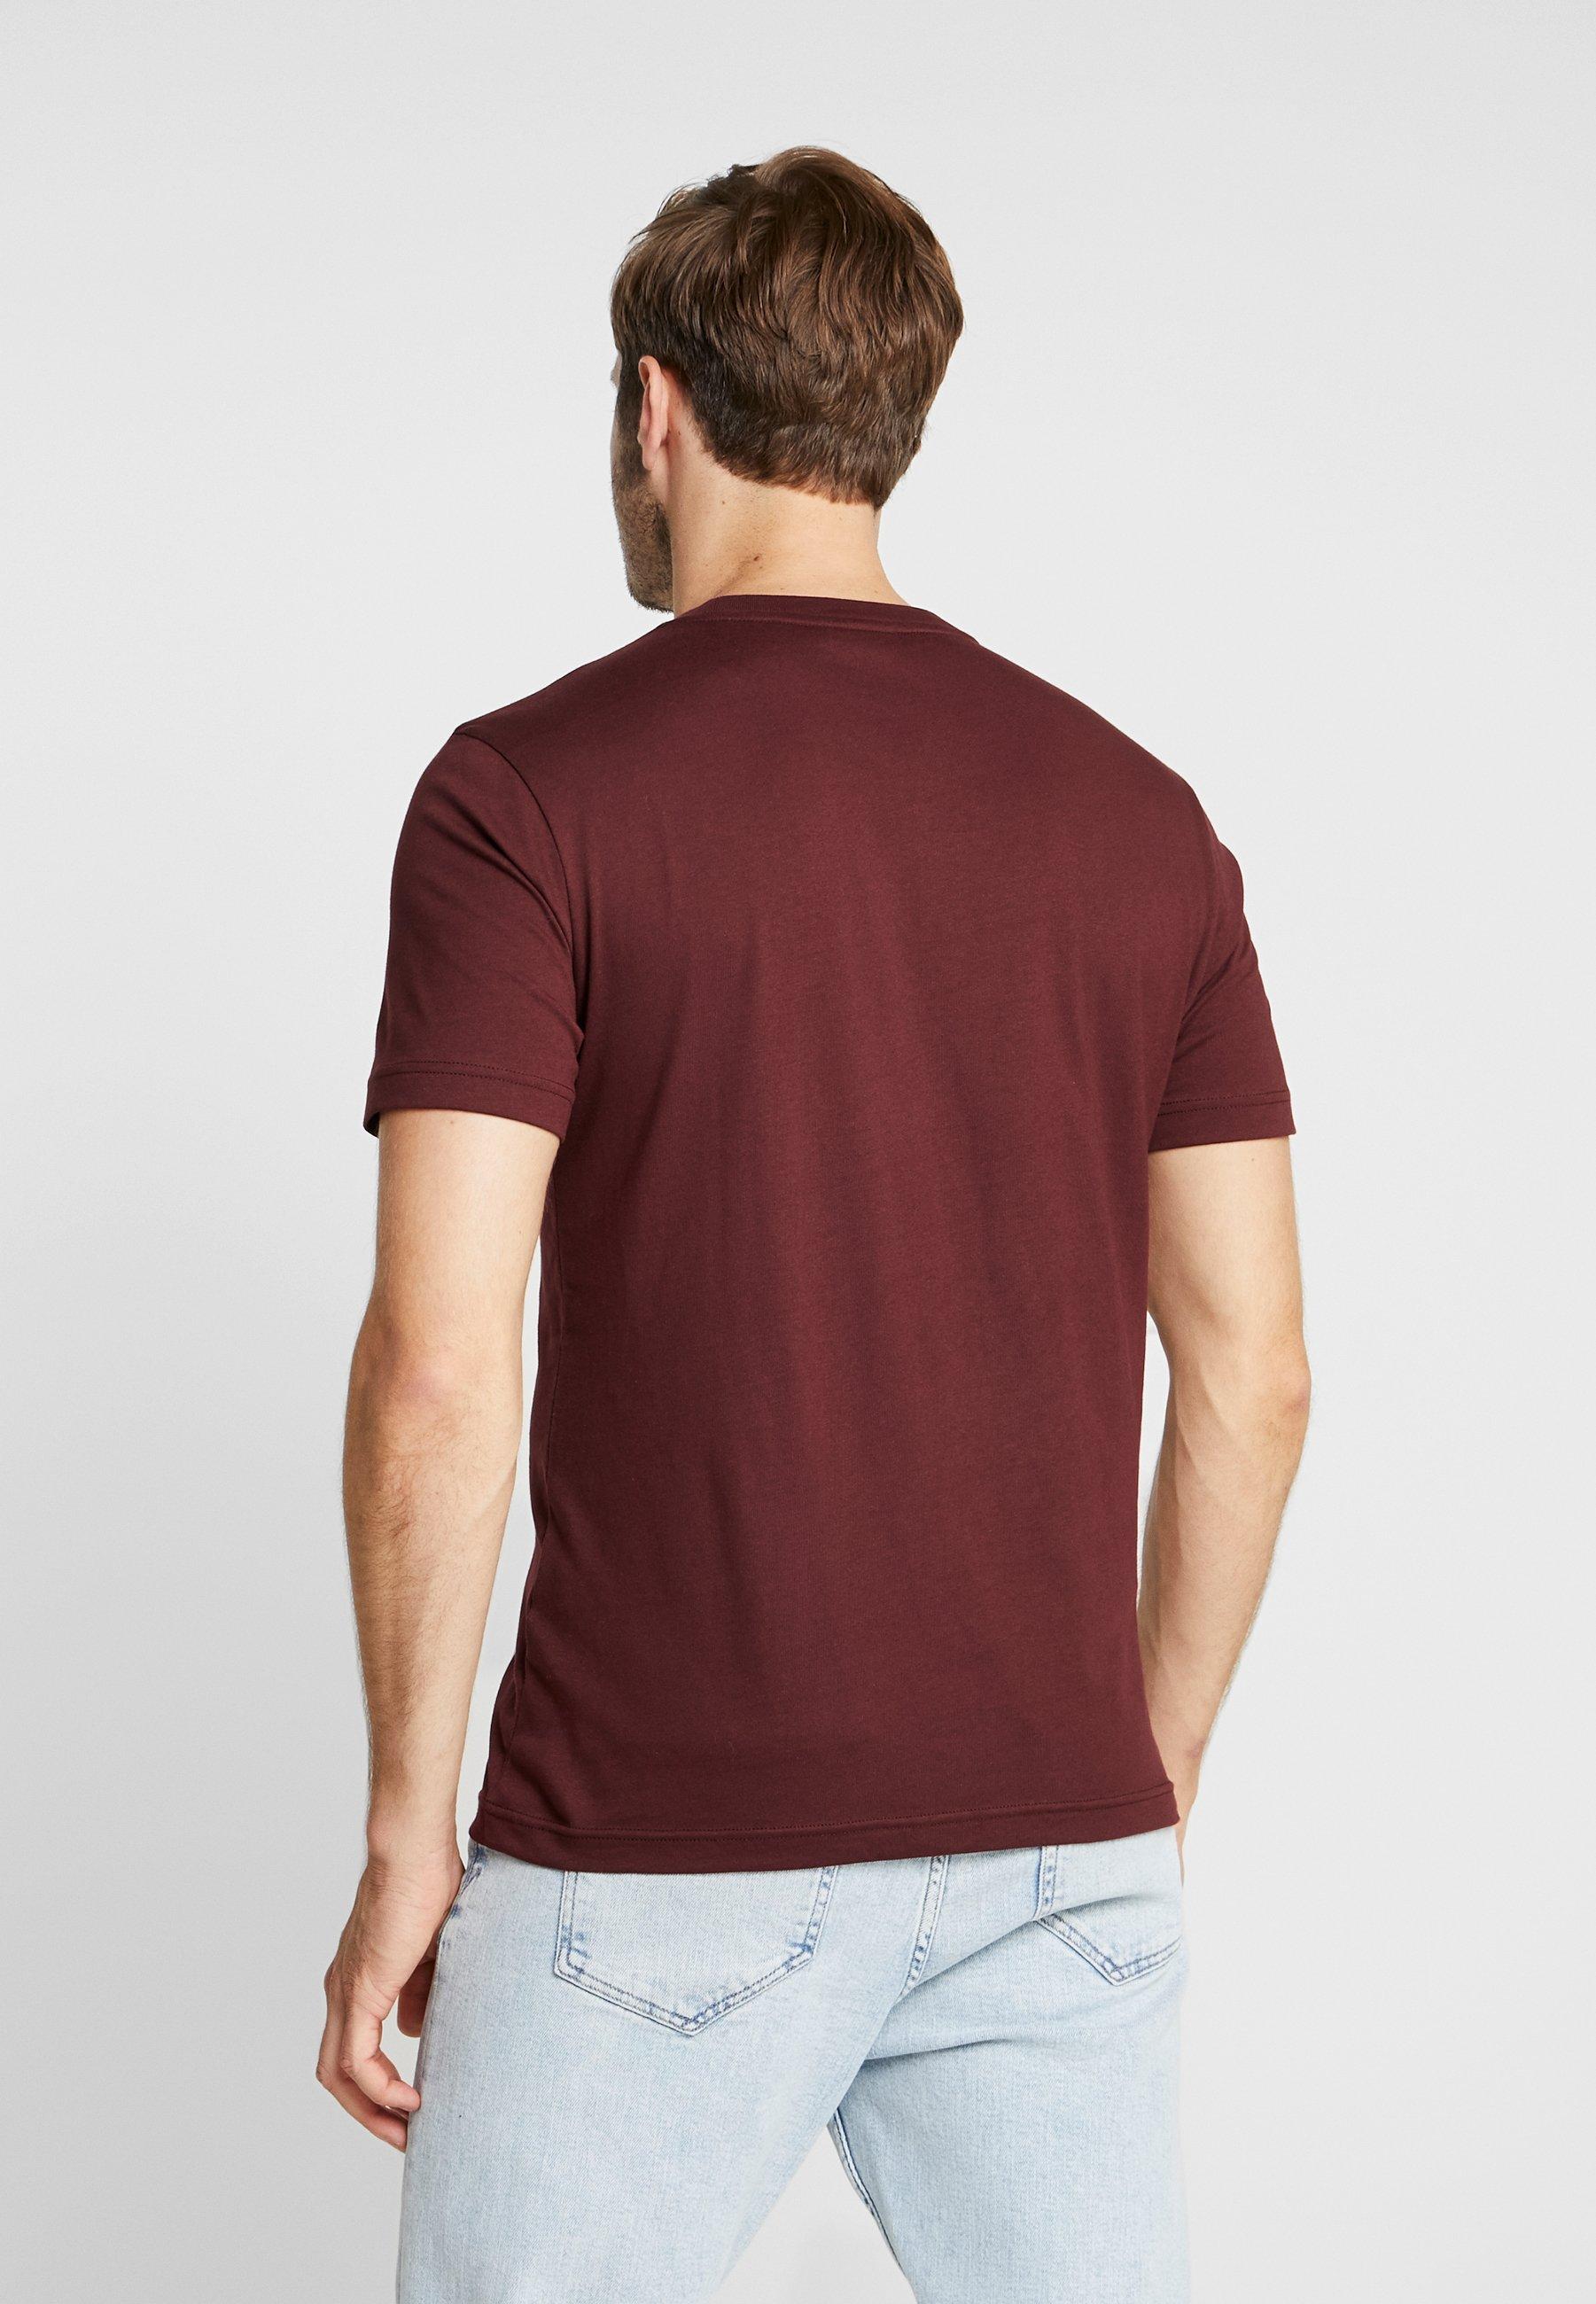 Basique Red Klein Chest Calvin LogoT shirt rdeWCoxB